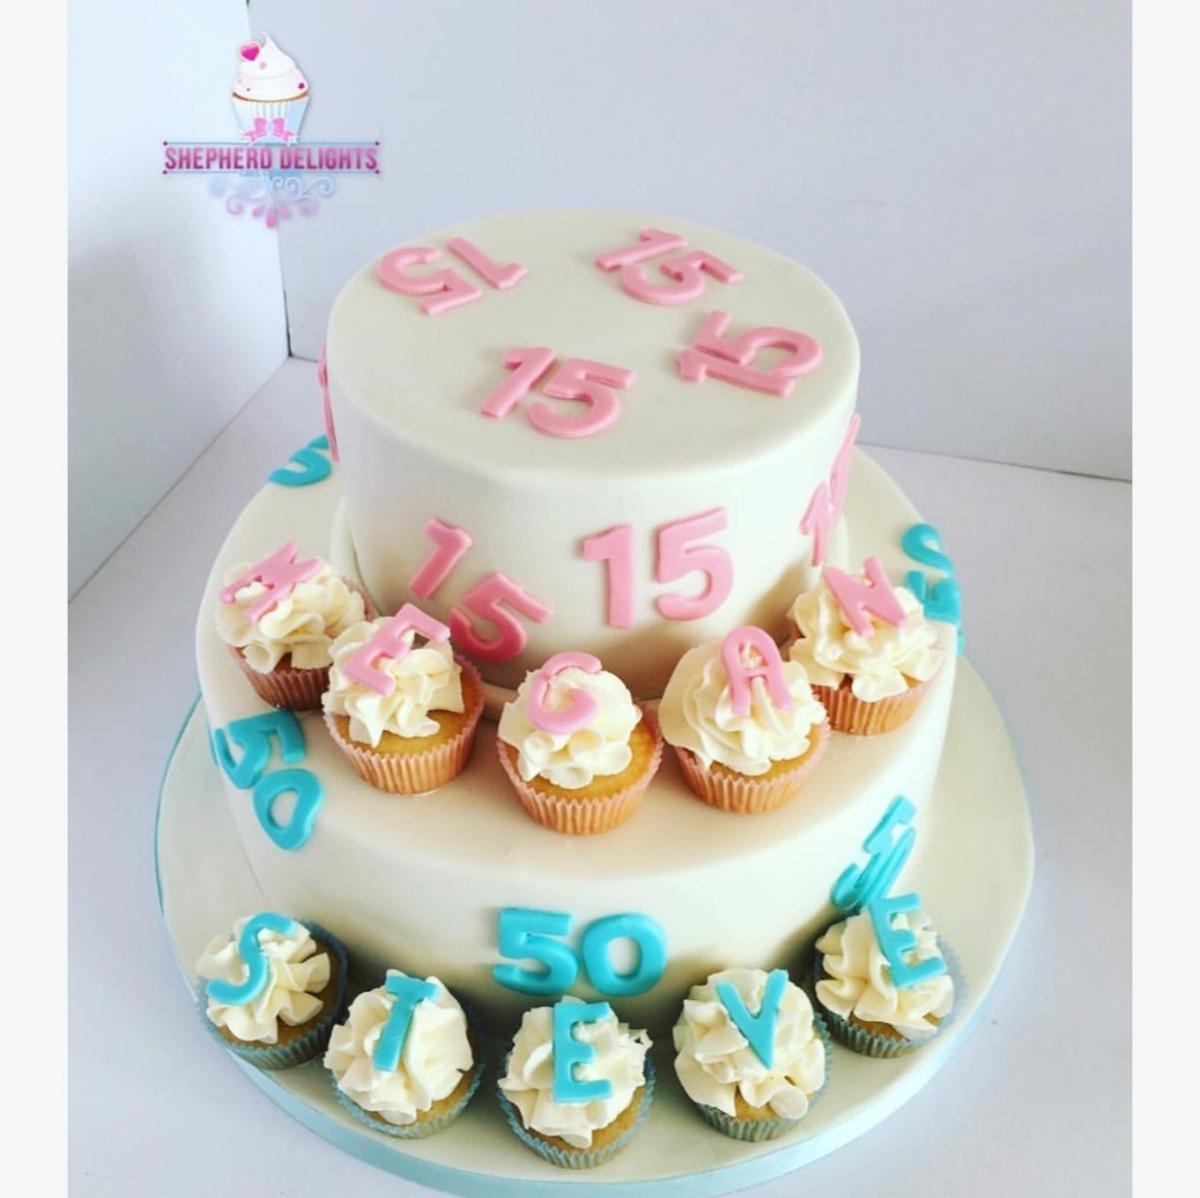 Pleasing Simple Two Tier Cake Age Cake Teenage Adult Birthday Cakes Personalised Birthday Cards Paralily Jamesorg